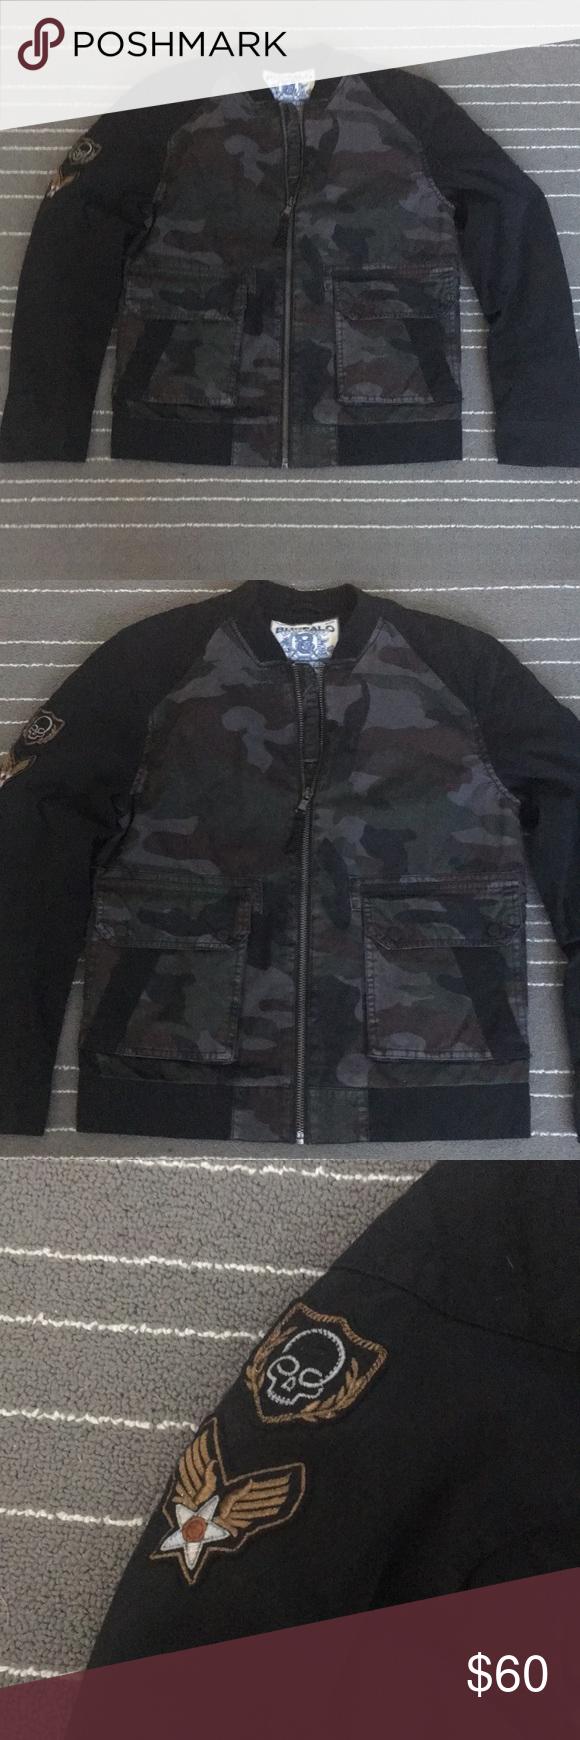 Nwt Buffalo Jeans Camo Jacket Buffalo Jeans Jackets Camo Jacket [ 1740 x 580 Pixel ]